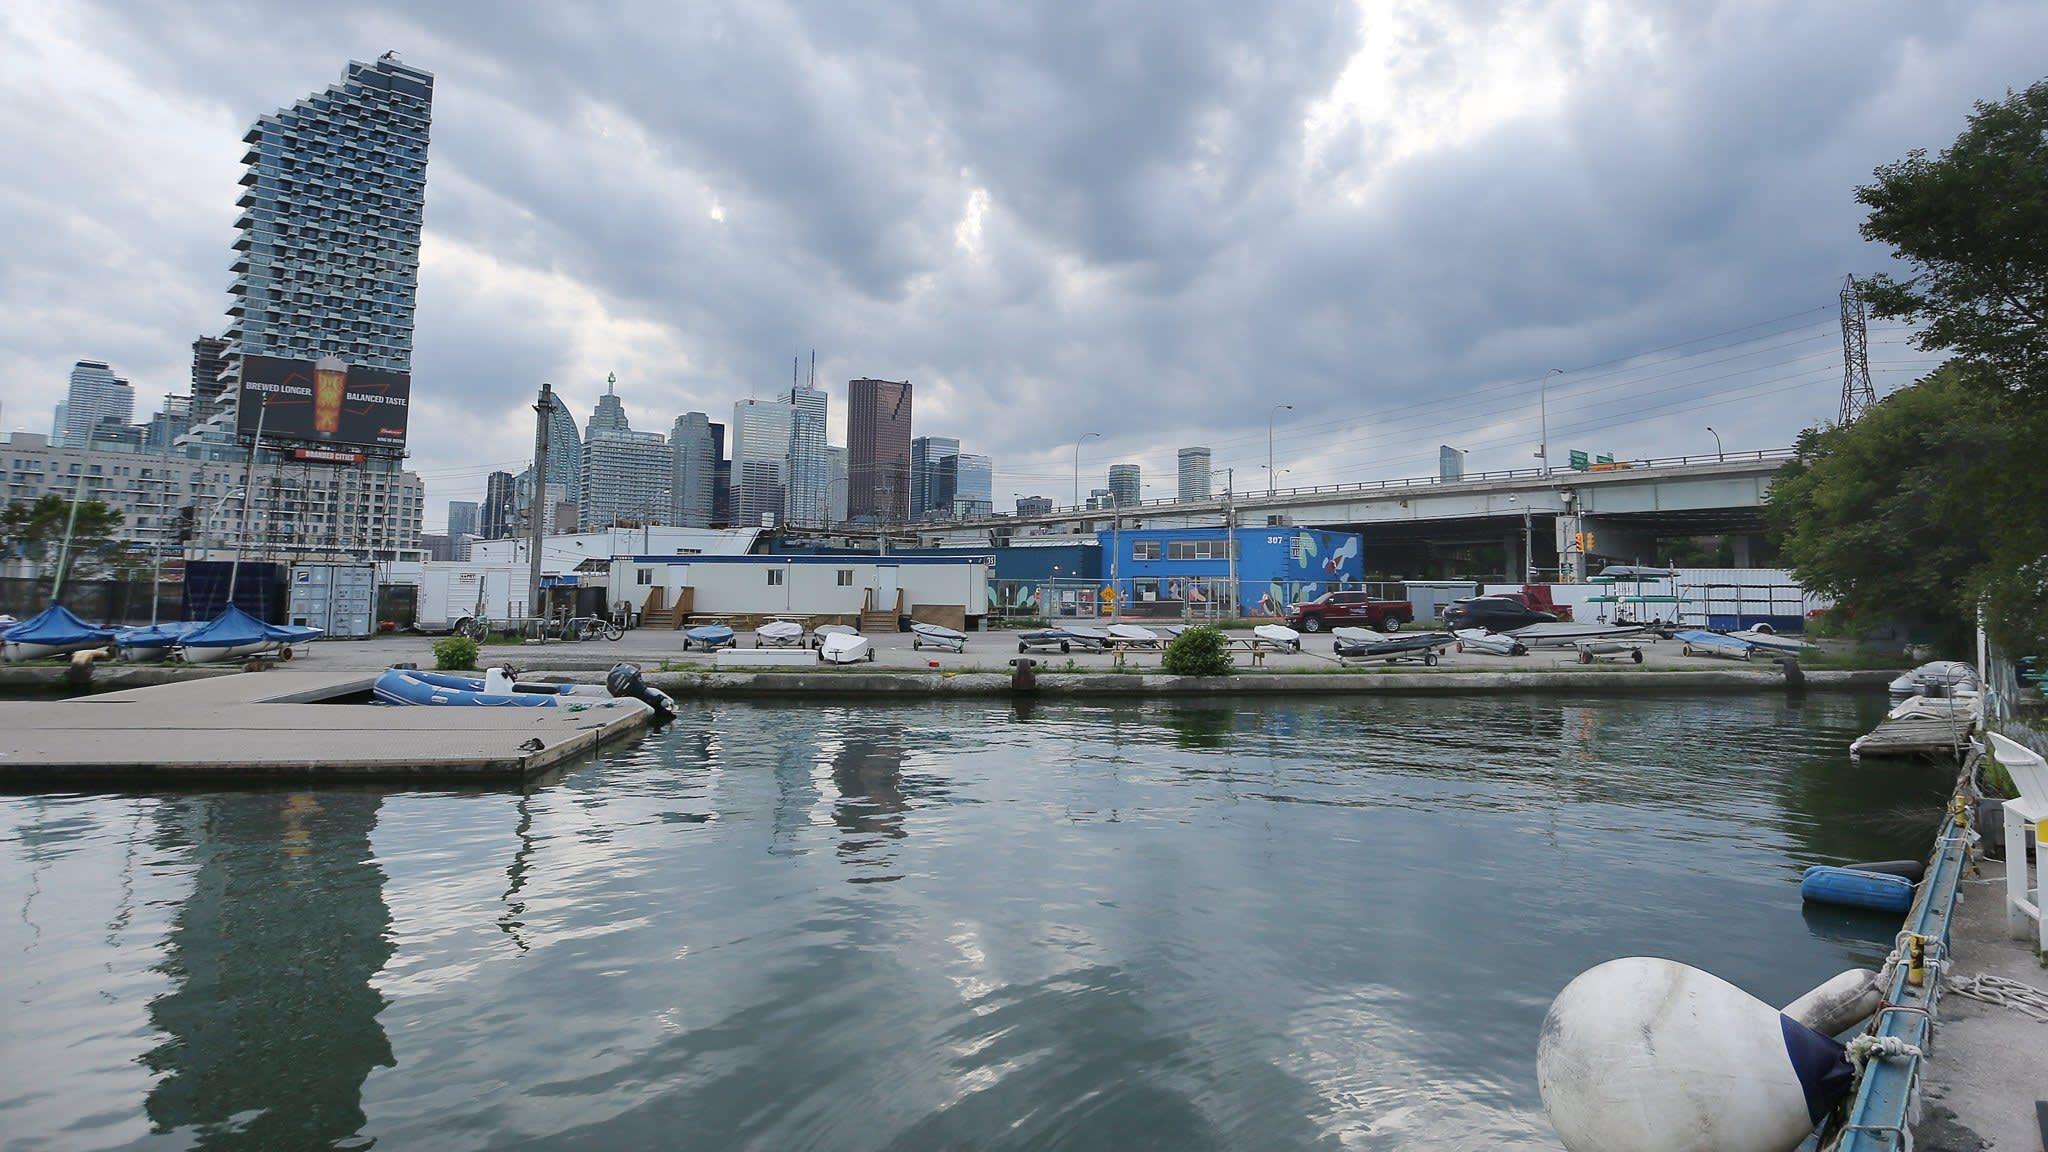 Smart city travel crosses the public-private divide